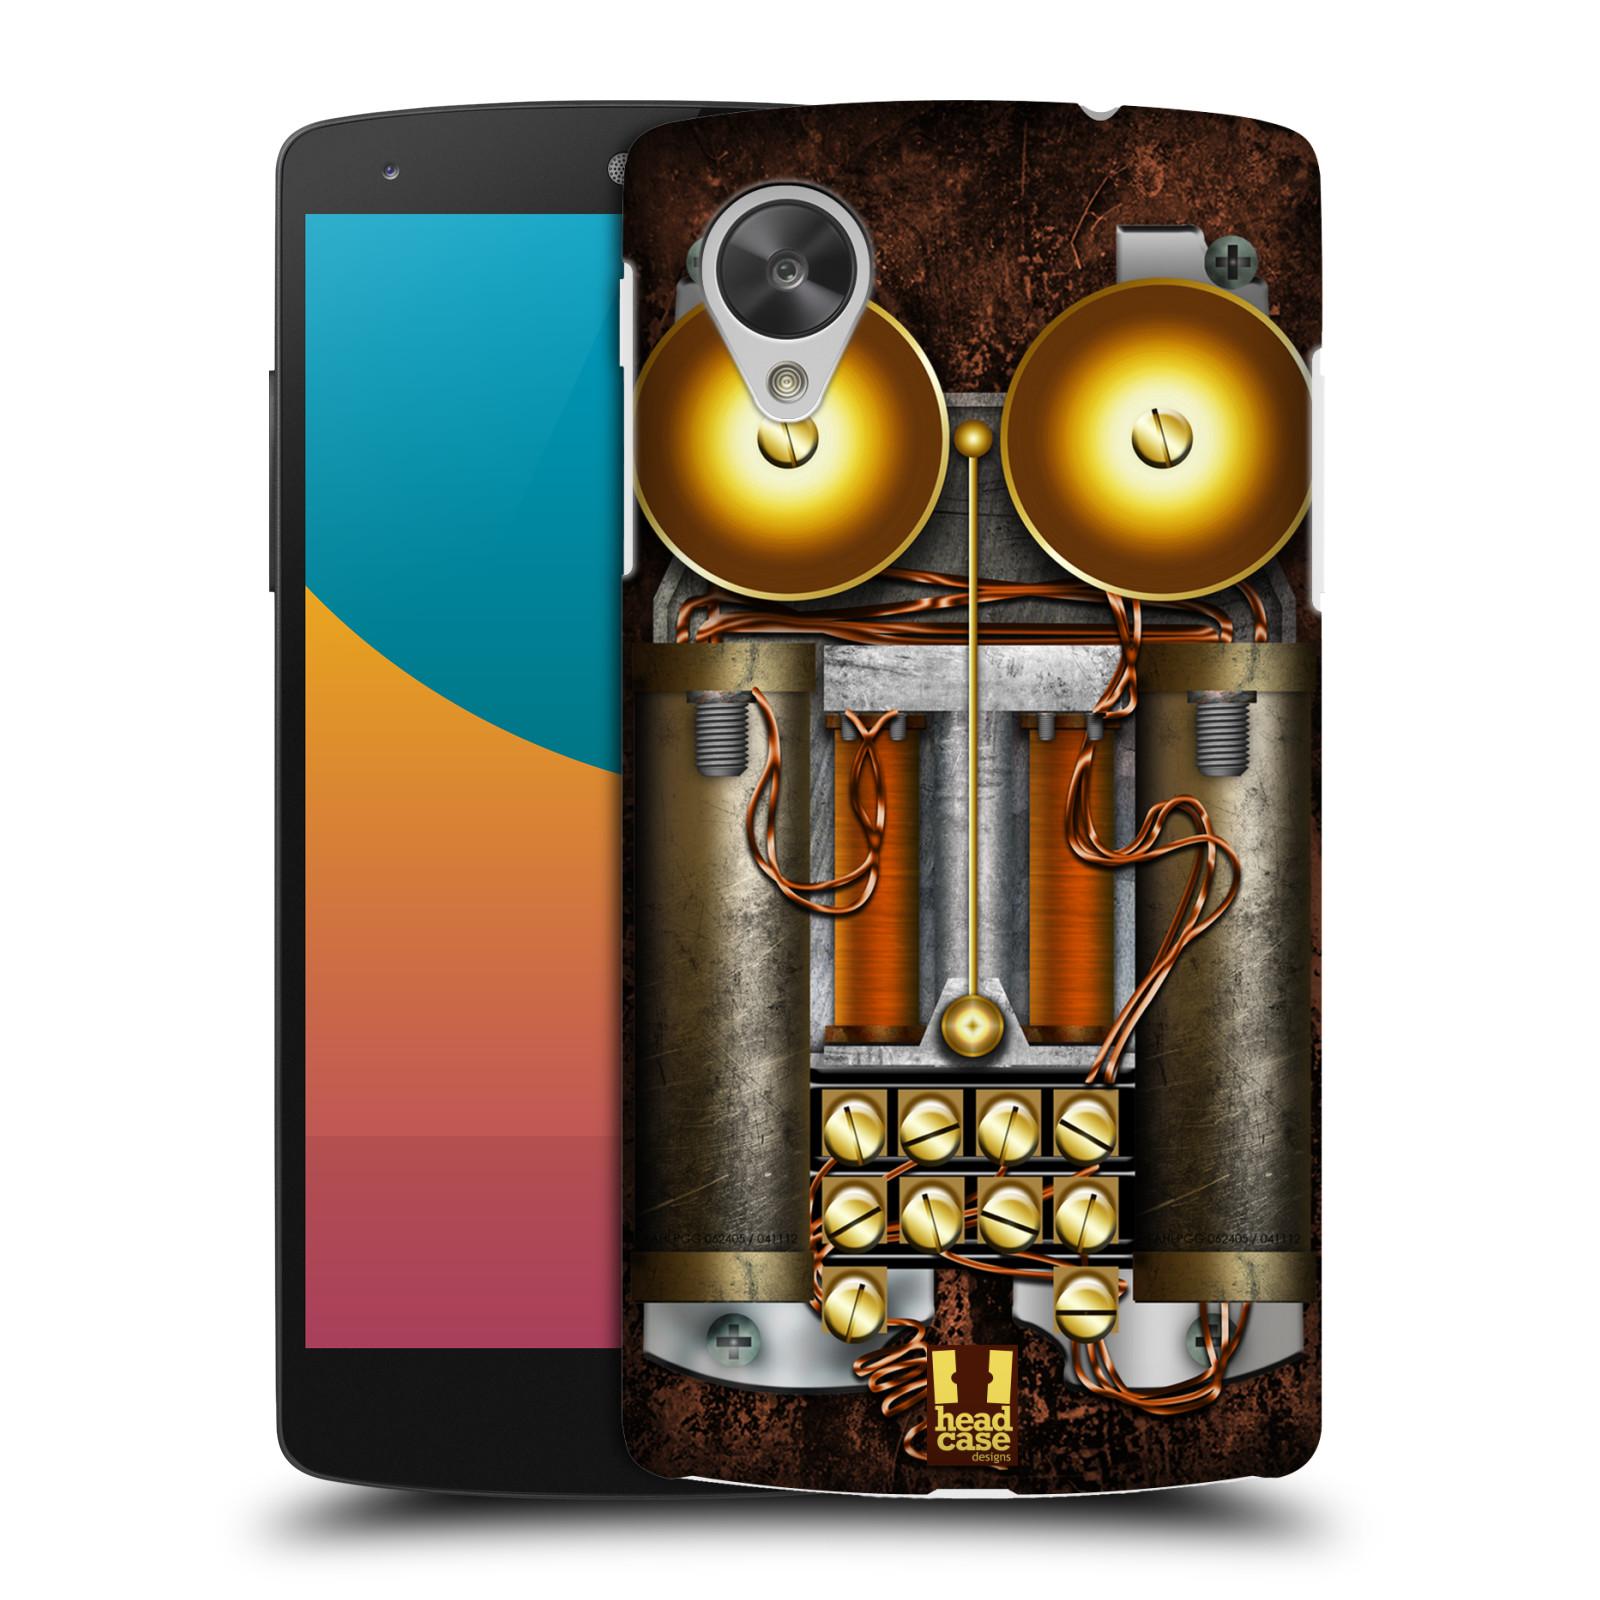 Plastové pouzdro na mobil LG Nexus 5 HEAD CASE STEAMPUNK TELEFON (Kryt či obal na mobilní telefon LG Google Nexus 5 D821)